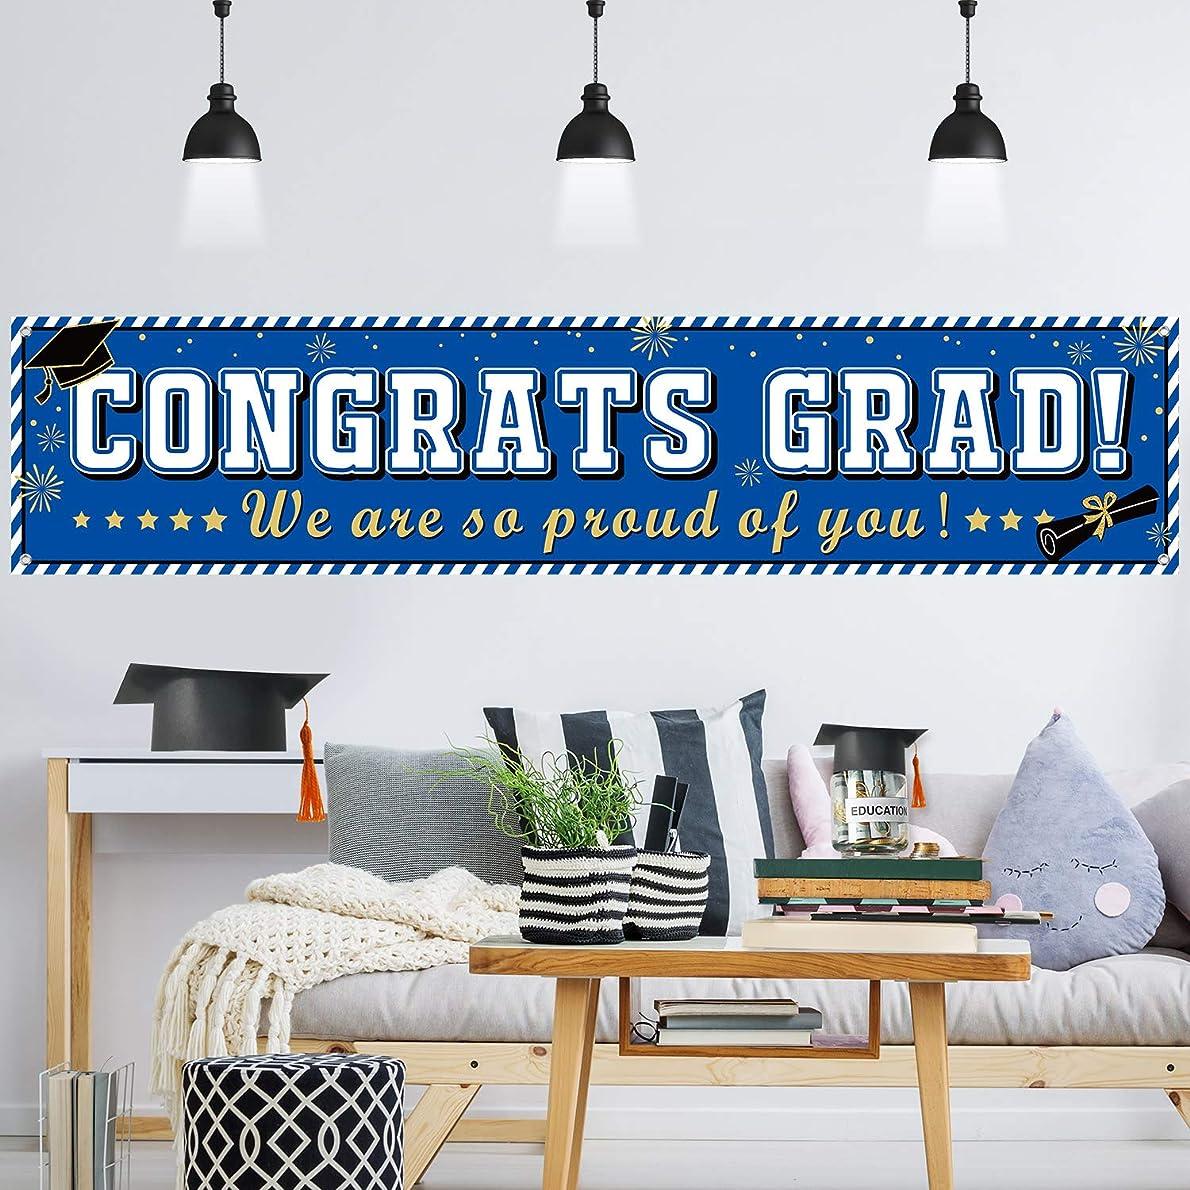 Graduation Banner 2019 Congrats Grad Banner Blue Graduation Decorations Fabric Grad Party Backdrop for 2019 Graduation Party Supplies htlvmw6062